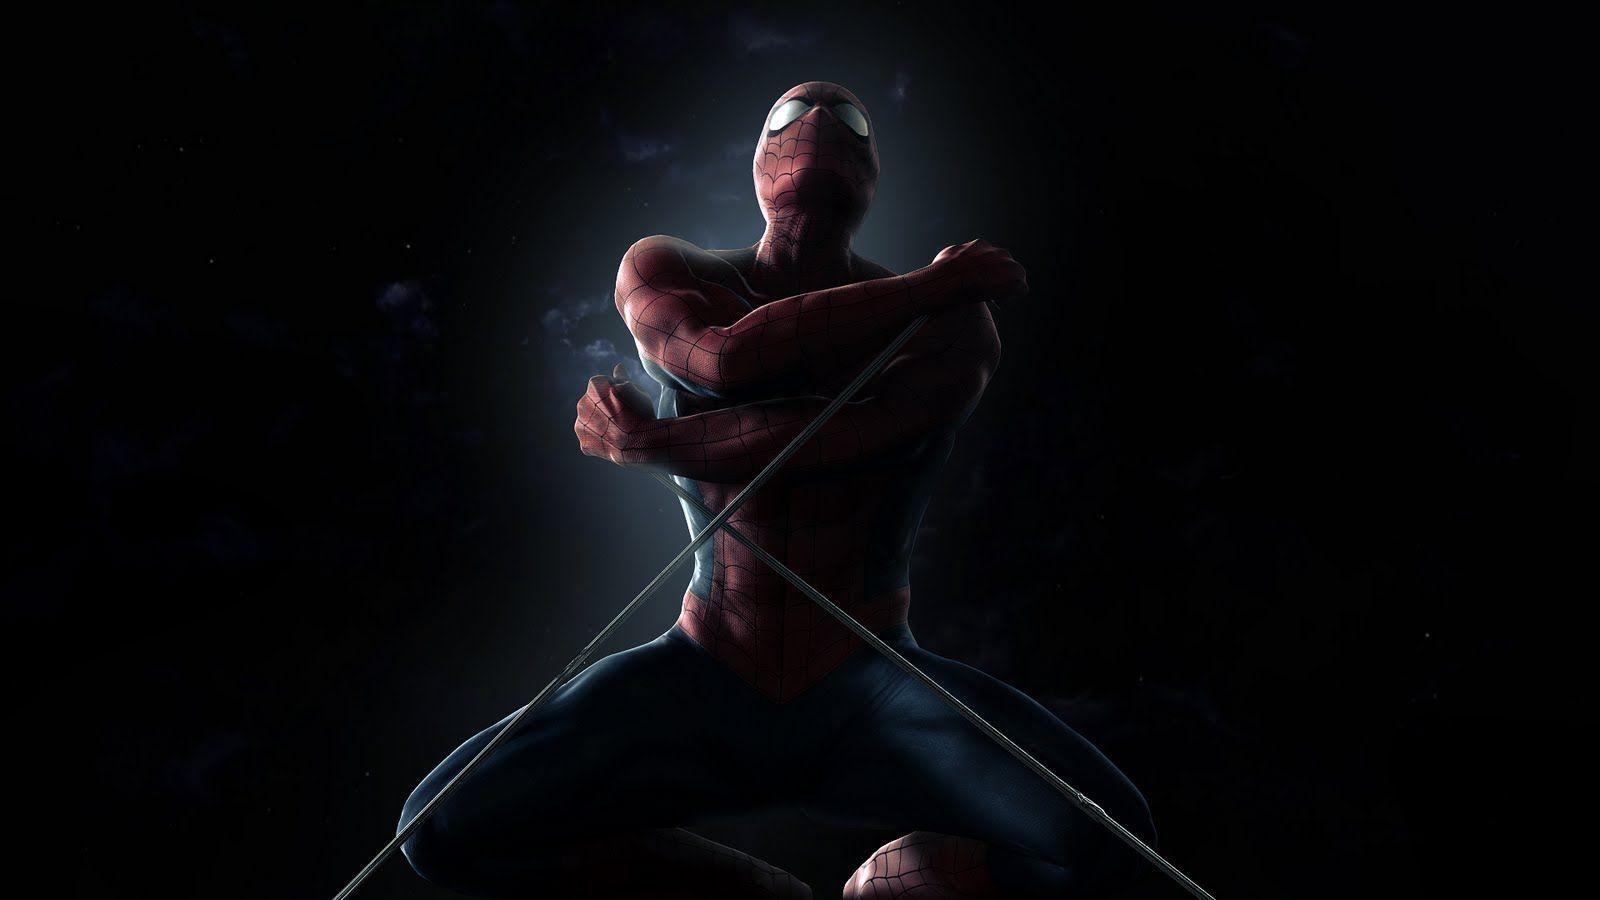 spiderman 4 hd wallpaper movie | Wallput.com